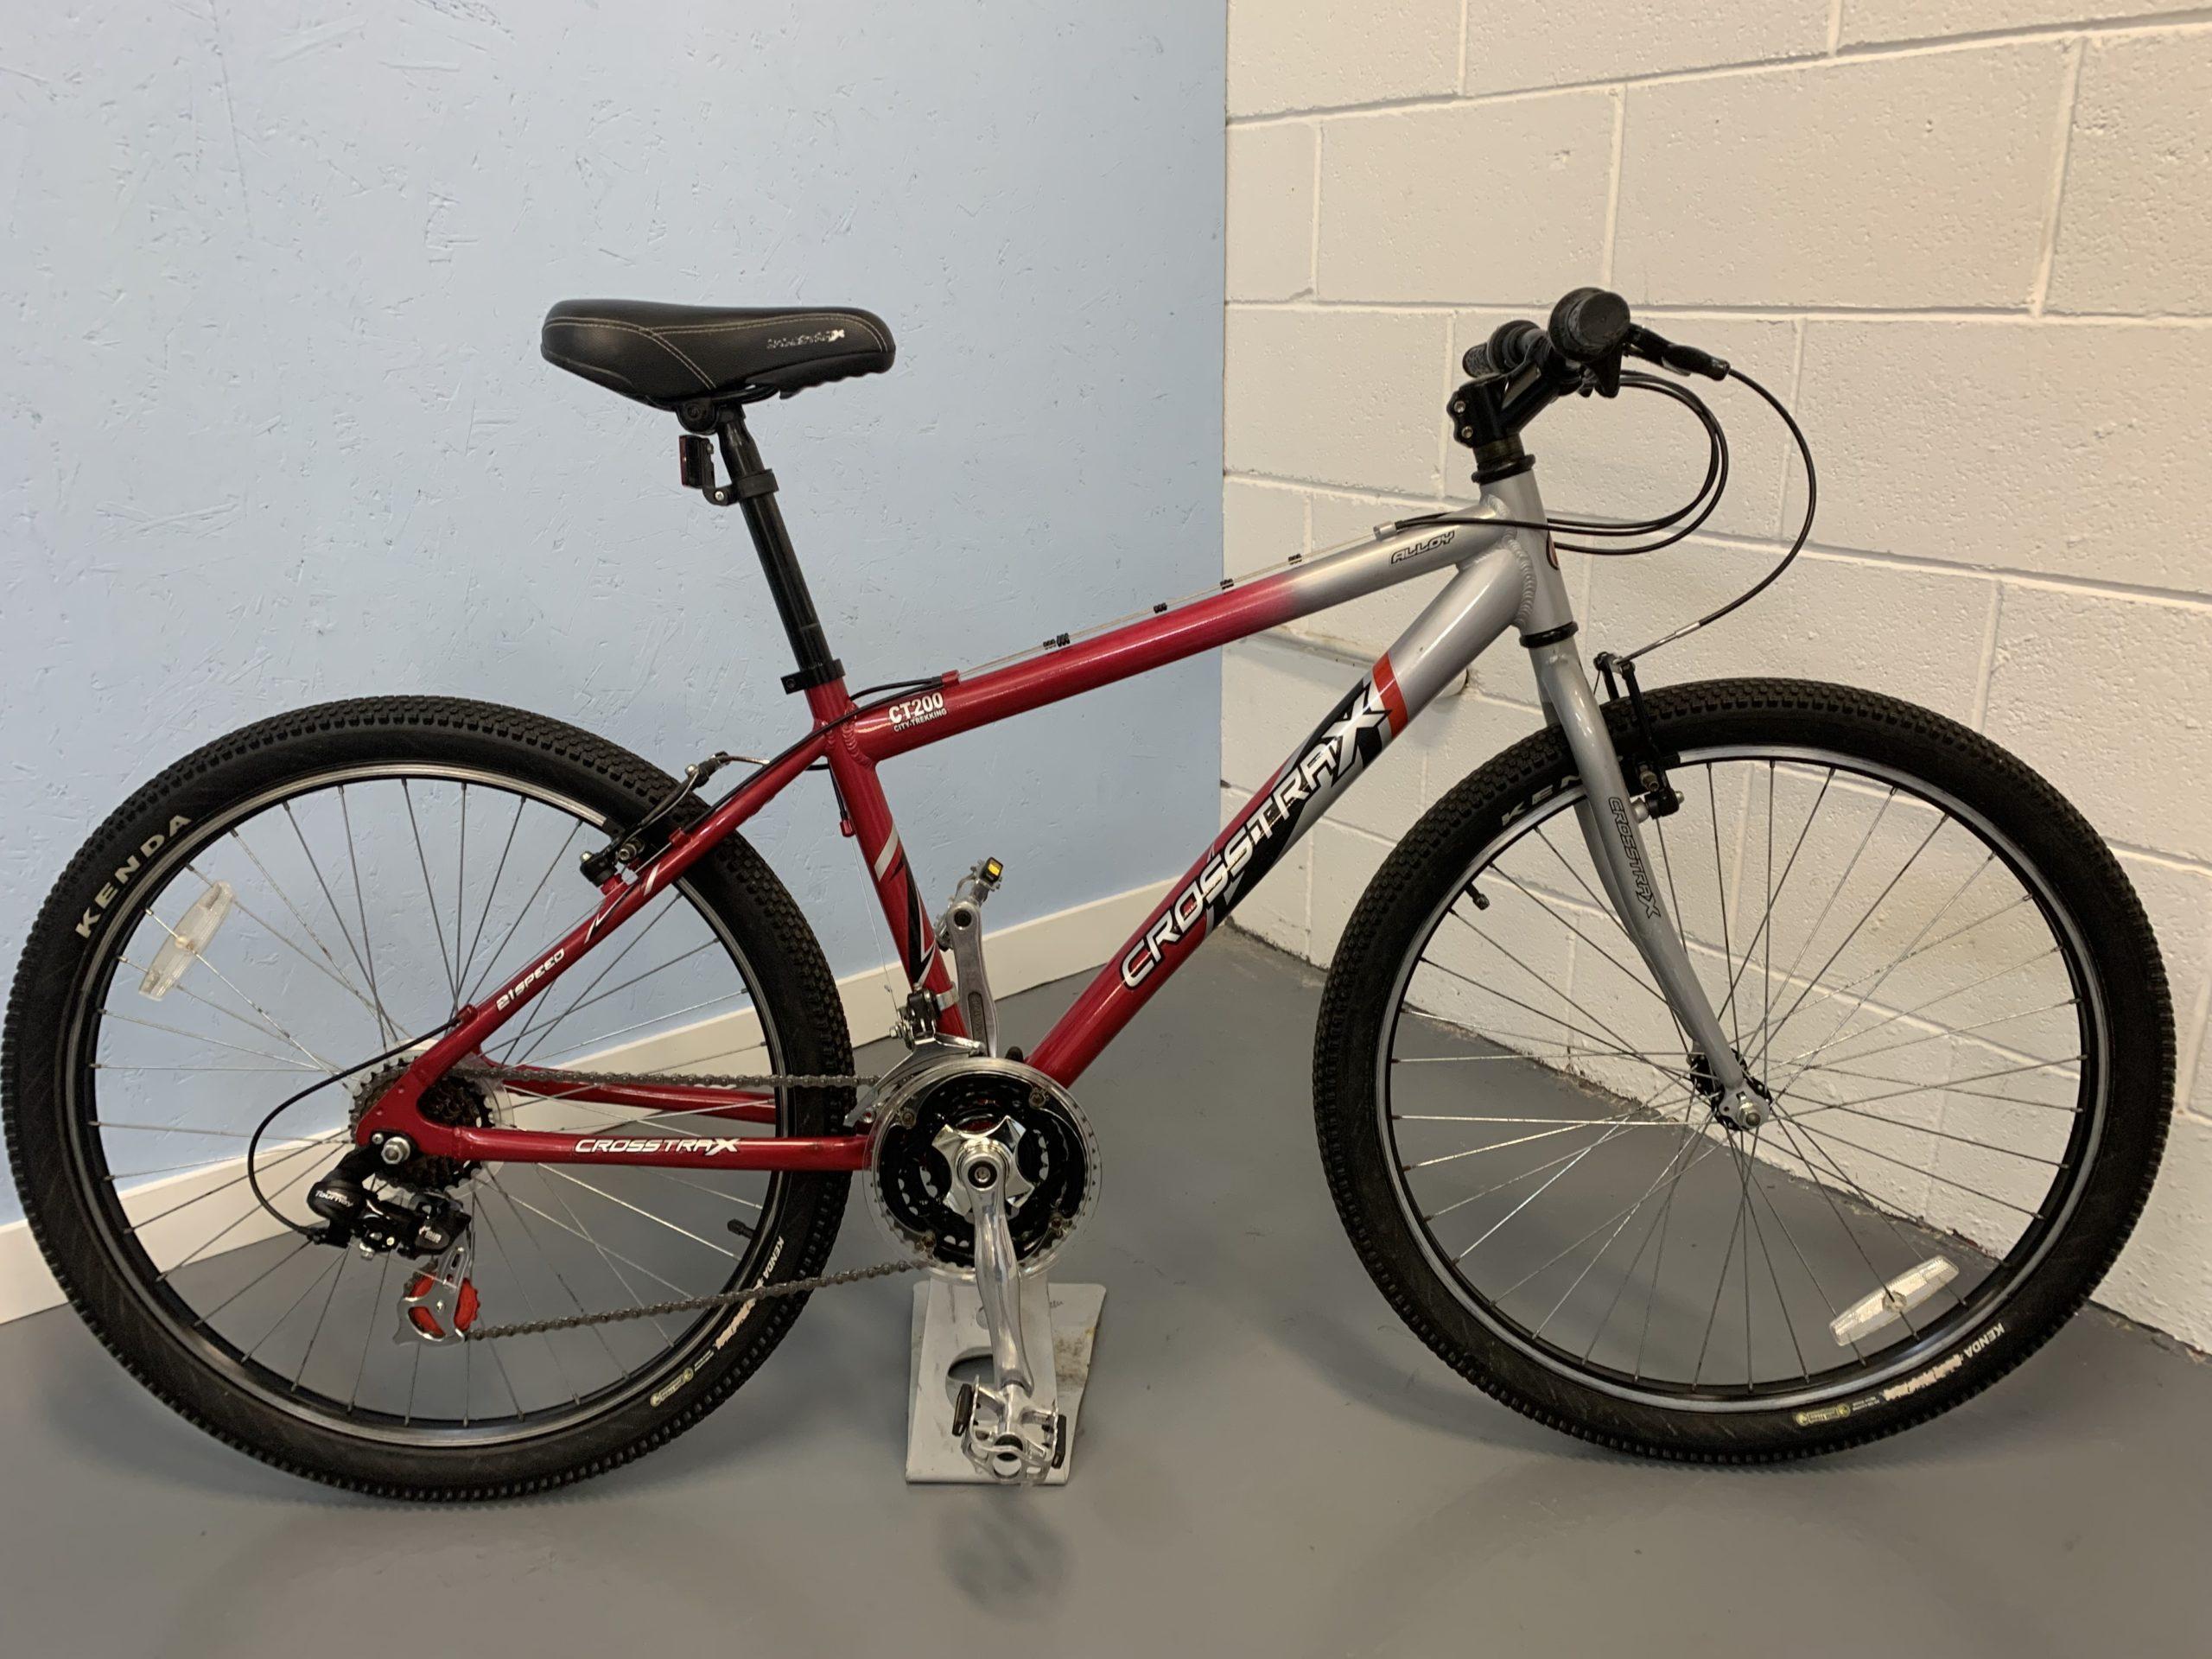 Crosstrax CT200 Mountain bike